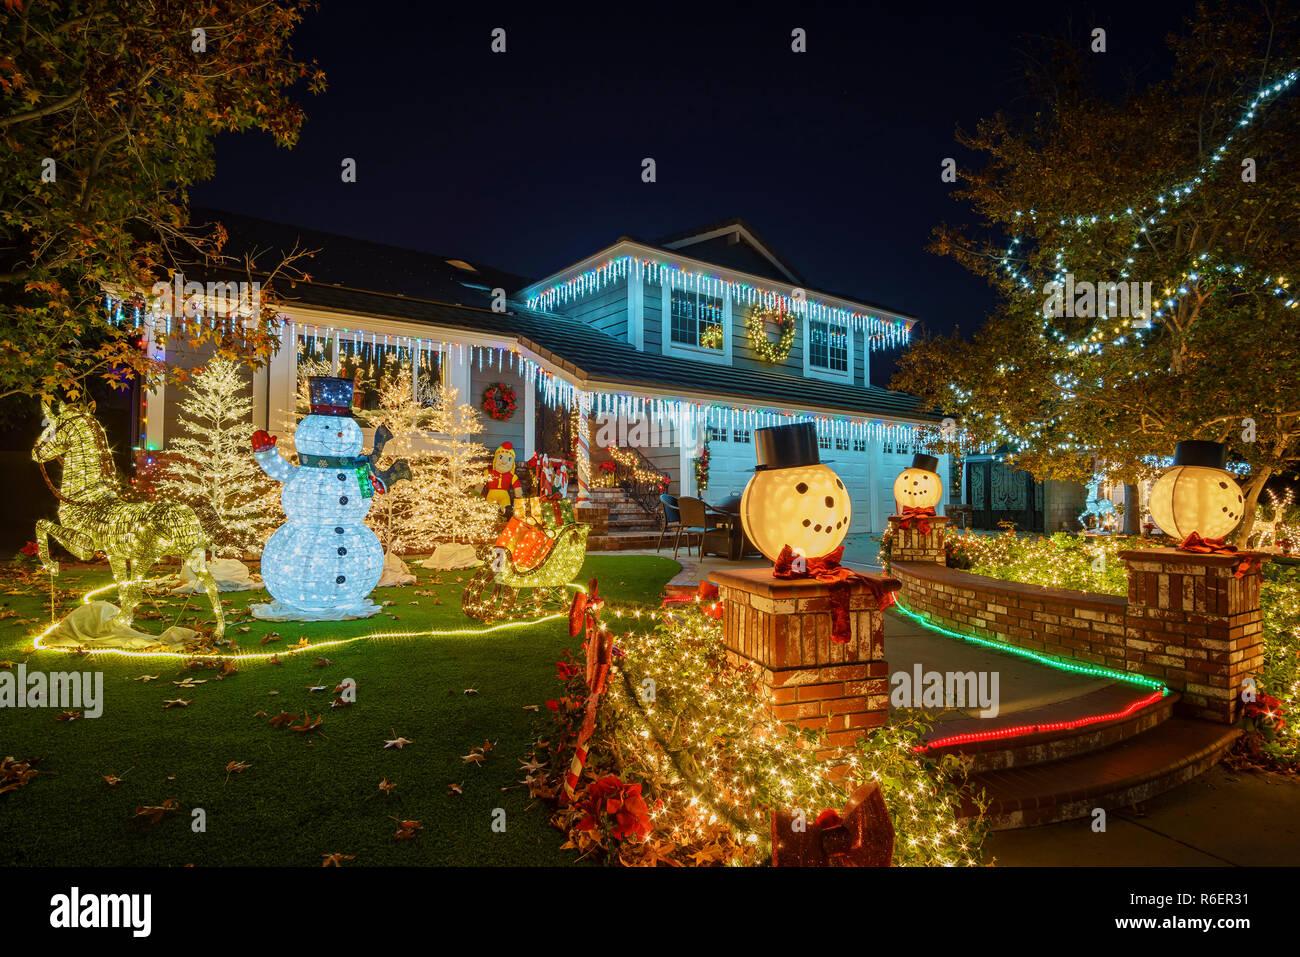 Brea Christmas Lights.Brea Dec 4 Beautiful Christmas Decoration On Dec 4 2018